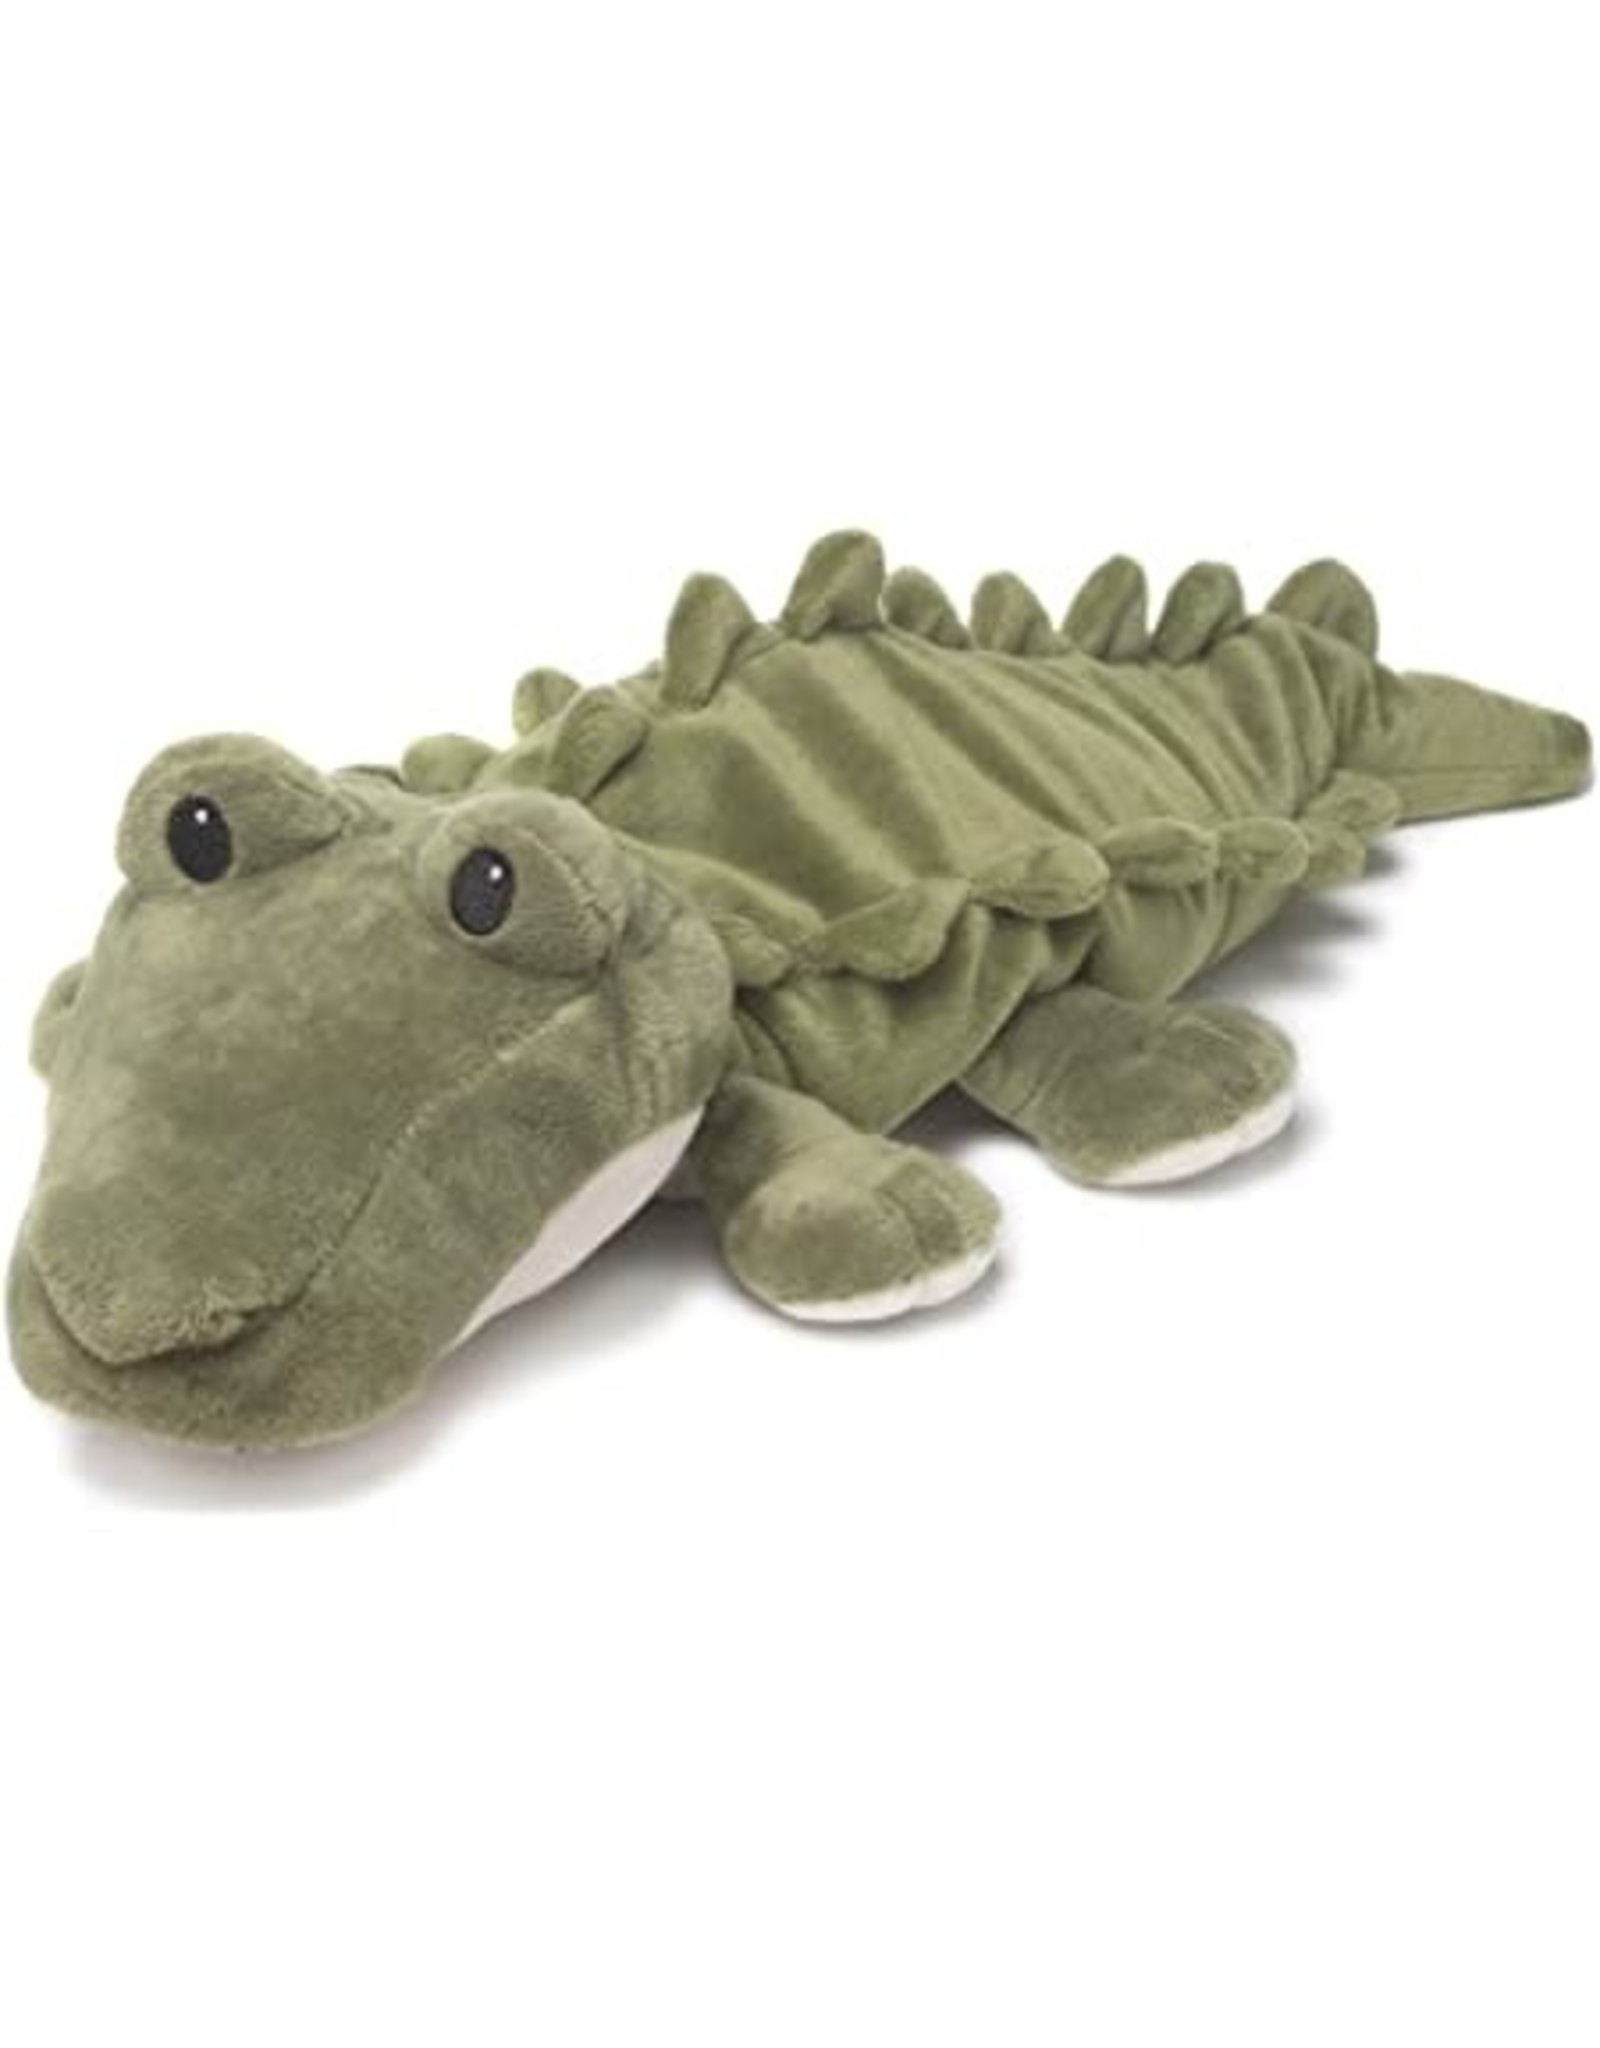 "Warmies Alligator Warmies Junior (9"")"